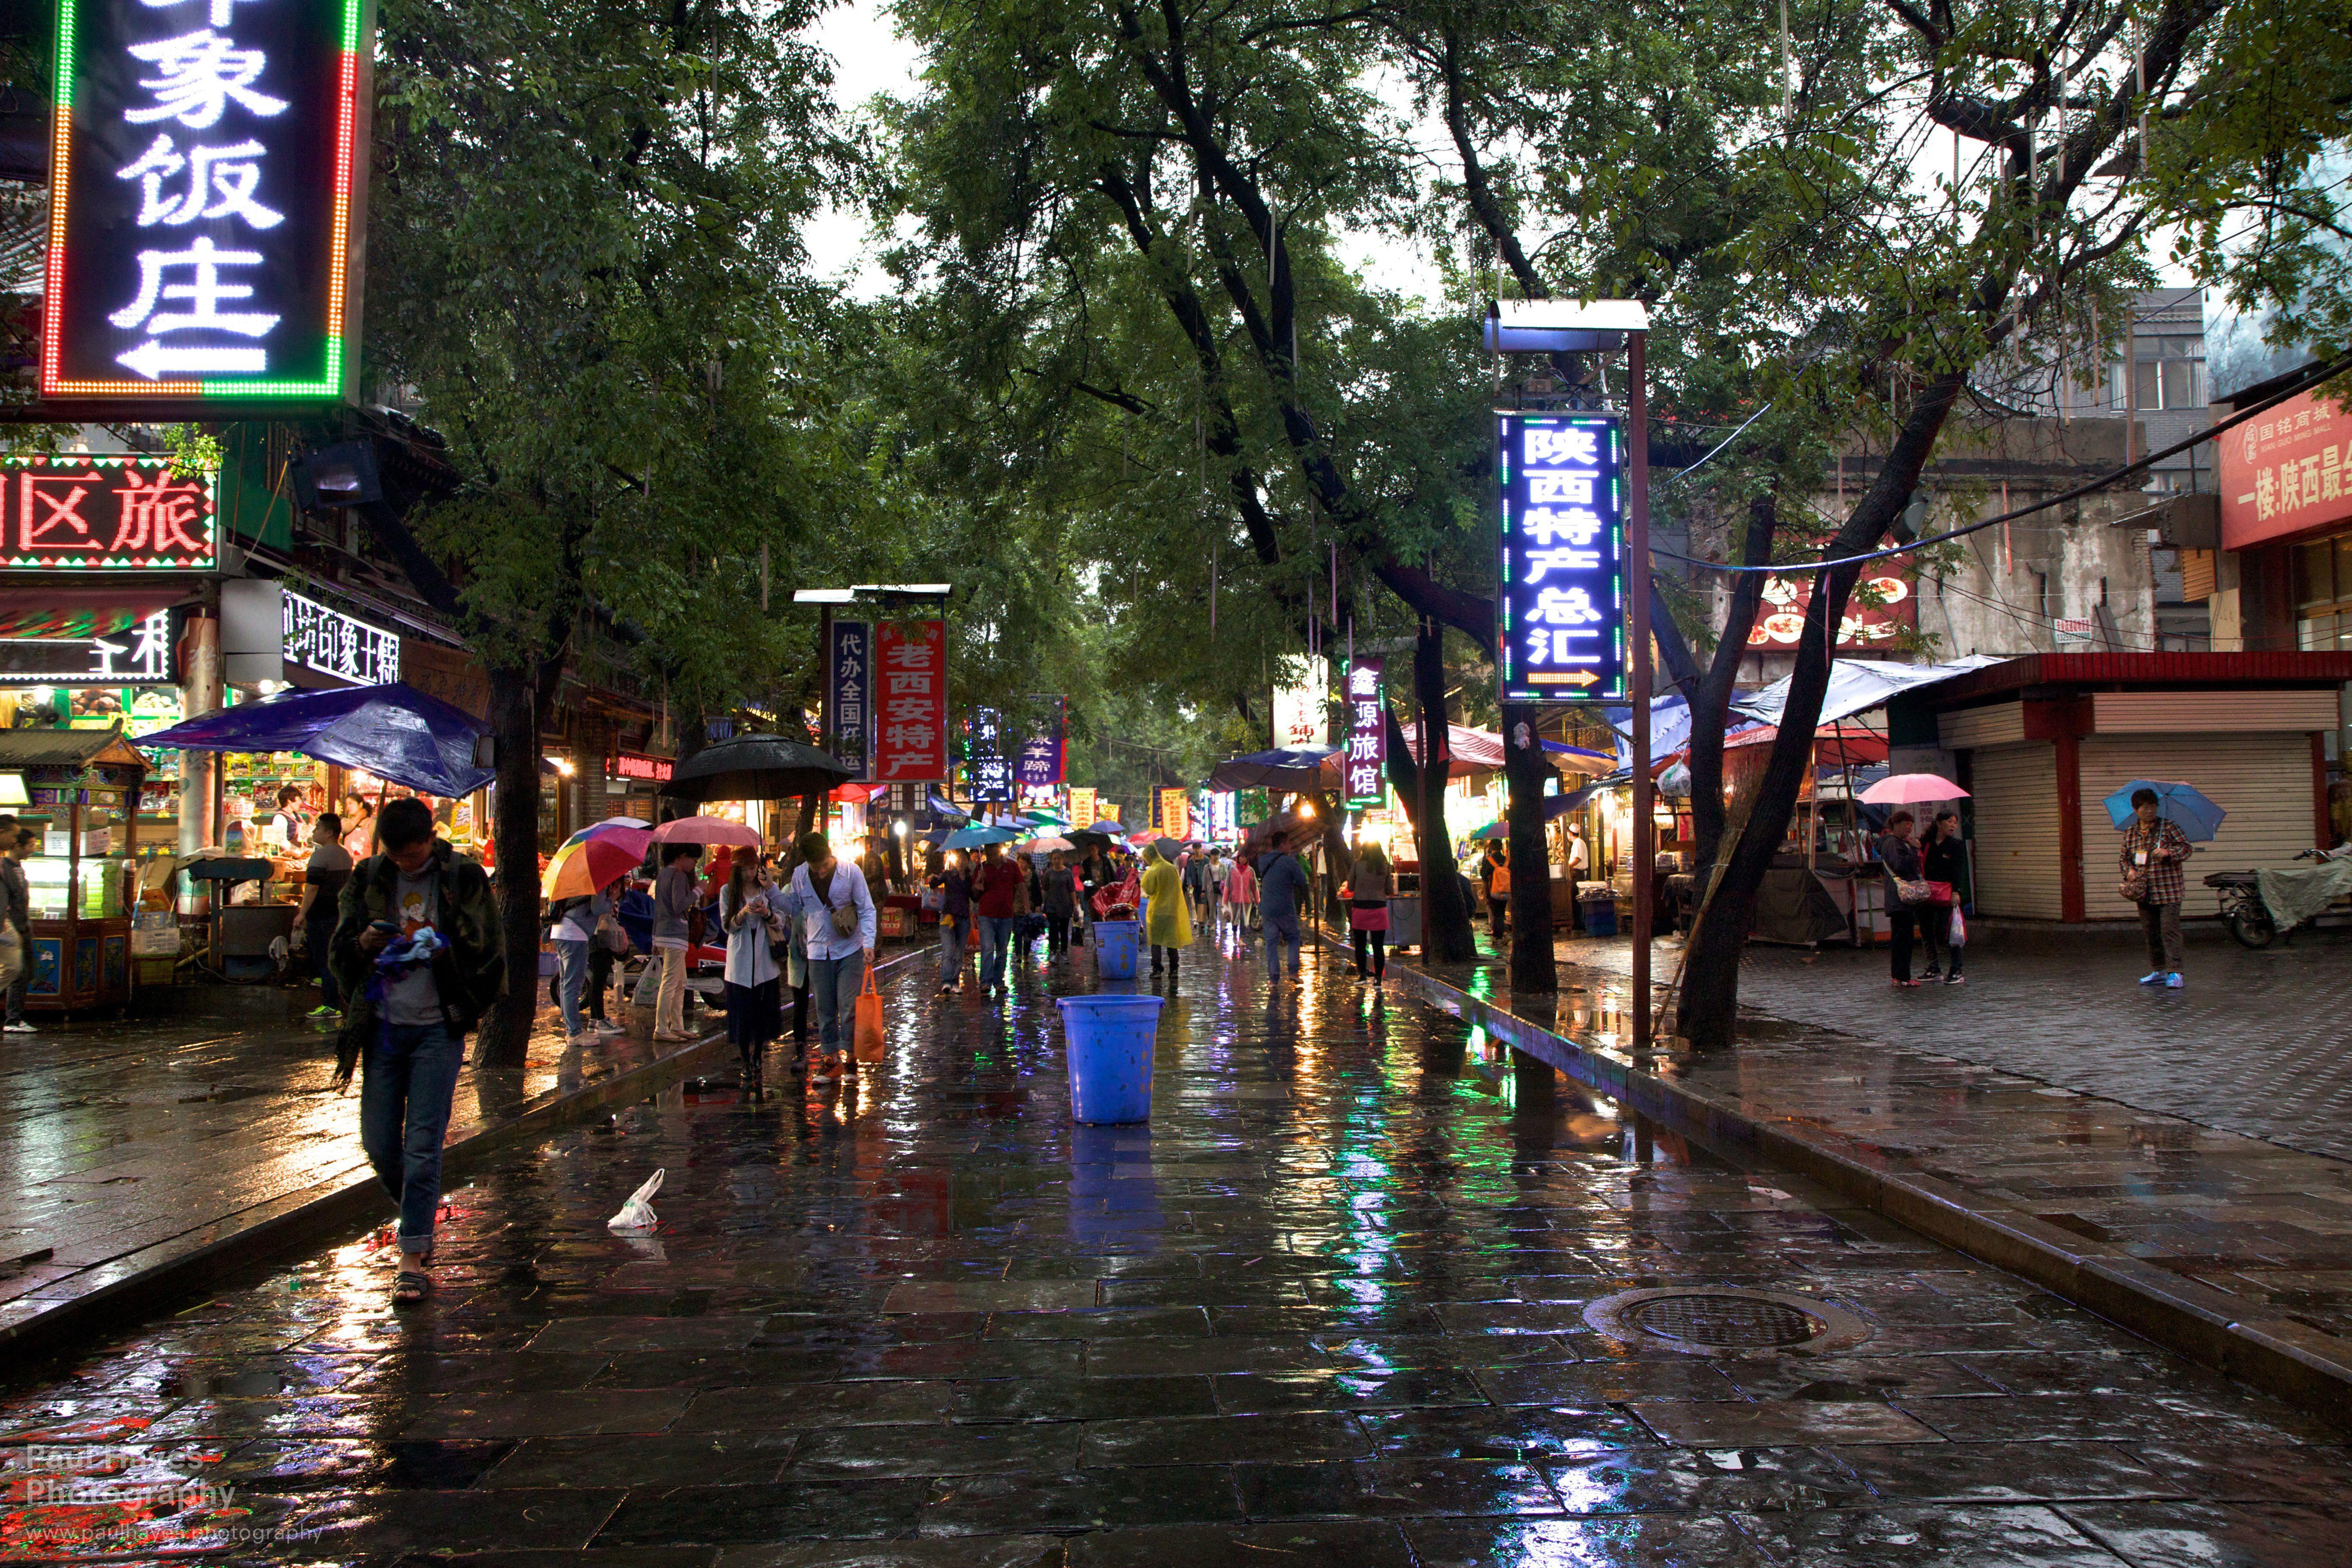 xian muslim Tongshengxiang cuisine: local xian muslim cuisine add: bell tower and drum tower square, xian tel: 029-87217521 location: right in.